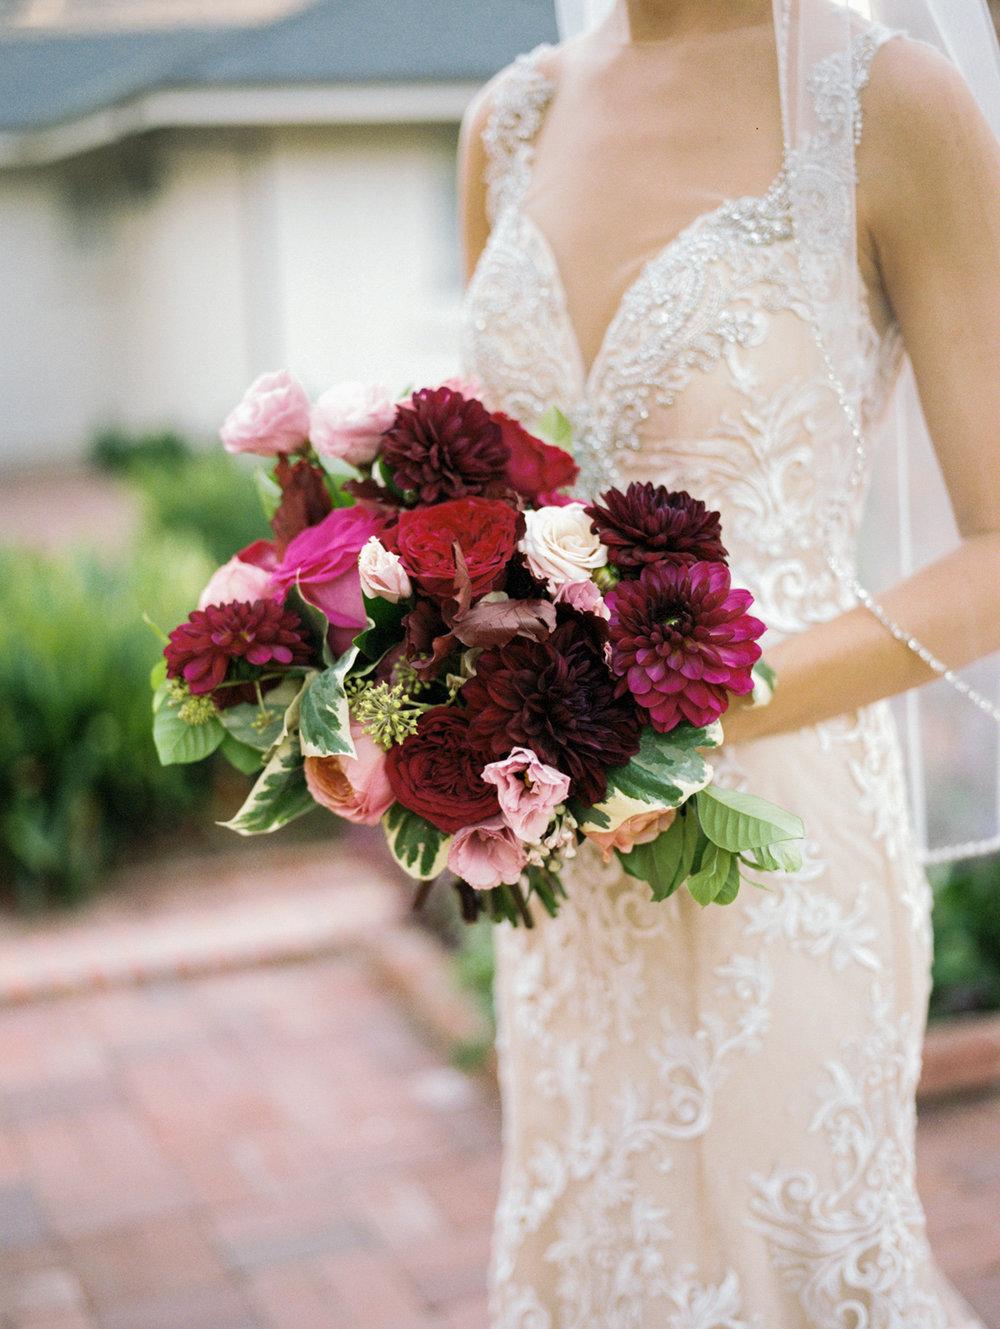 santa-barbara-elopement-elope-alegria-design-event-planner-coordinator-day-of-el-encanto-resort-lily-pond-wedding-intimate-red-maroon-city-ocean-view-rooftop (15).jpg